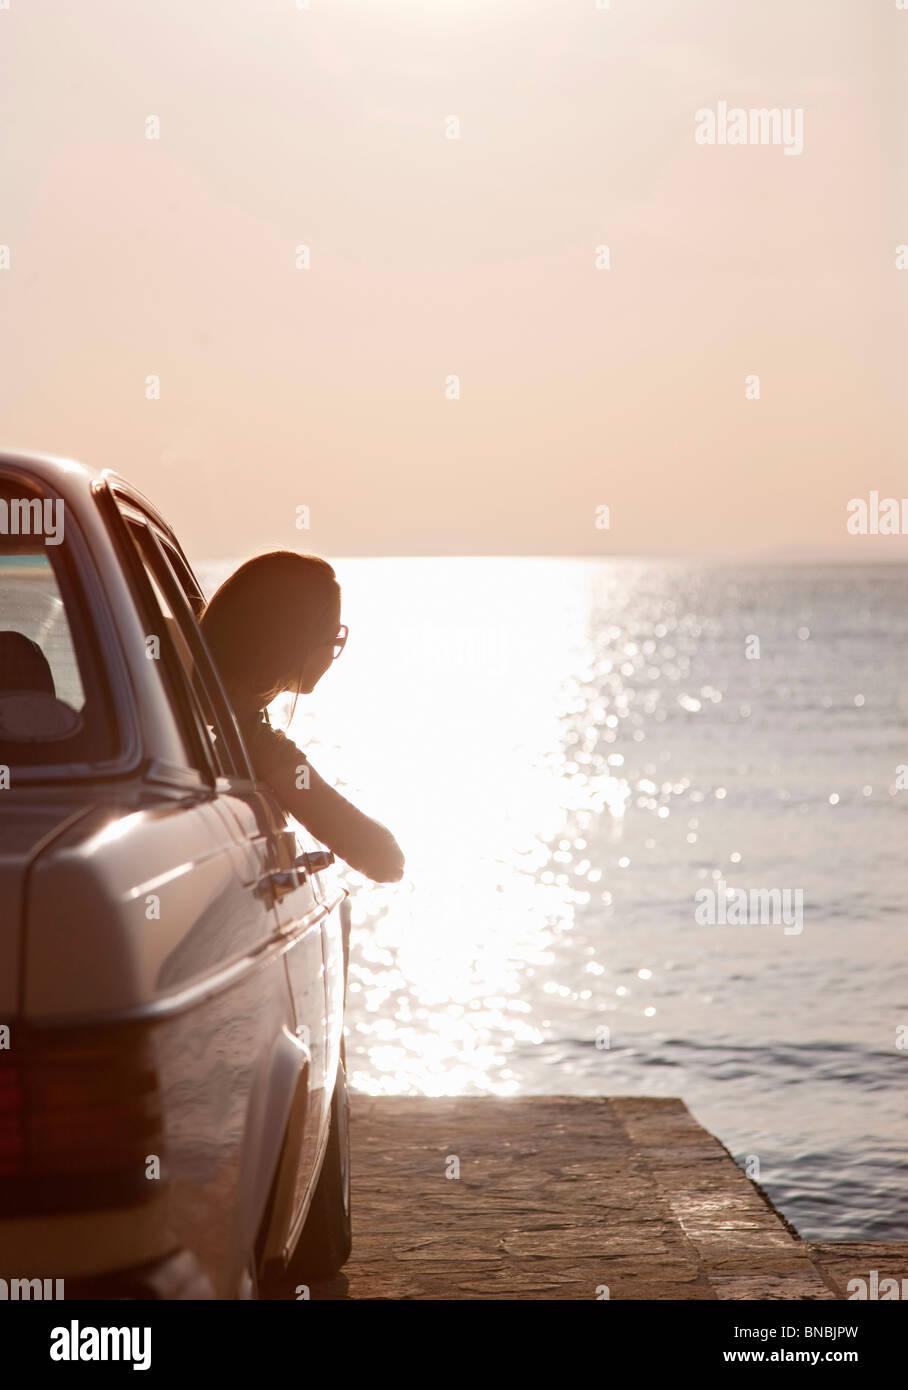 Frau mit Oldtimer auf dem Seeweg Stockbild